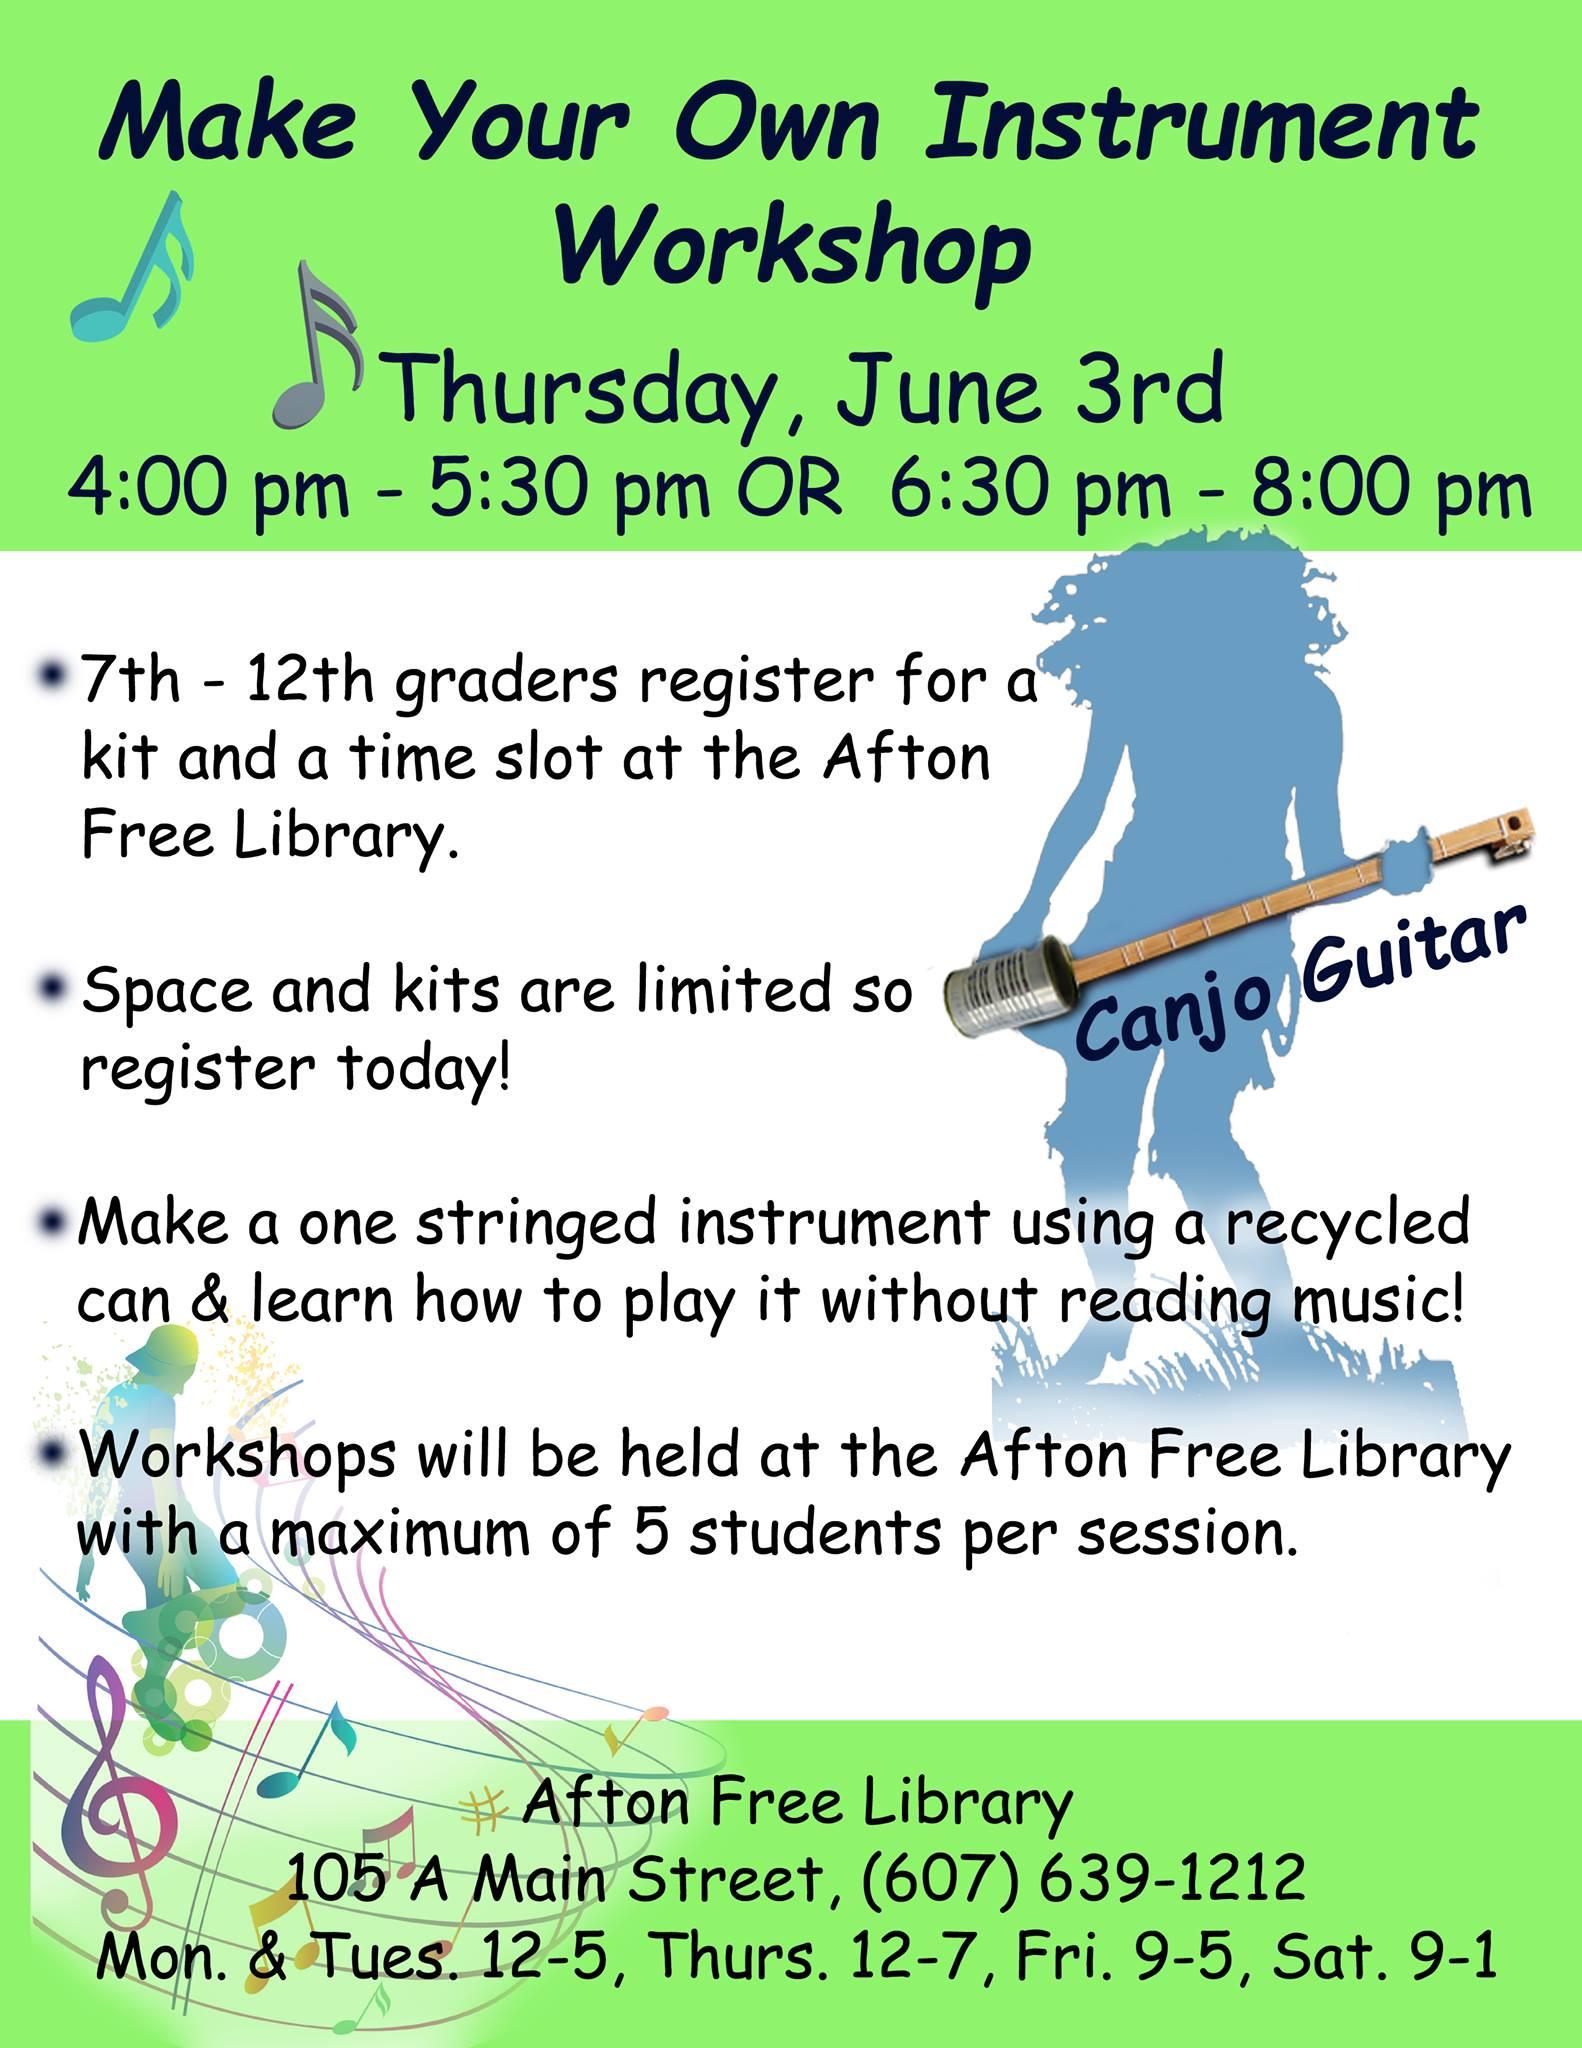 Teen Make Your Own Instrument Workshop – June 3